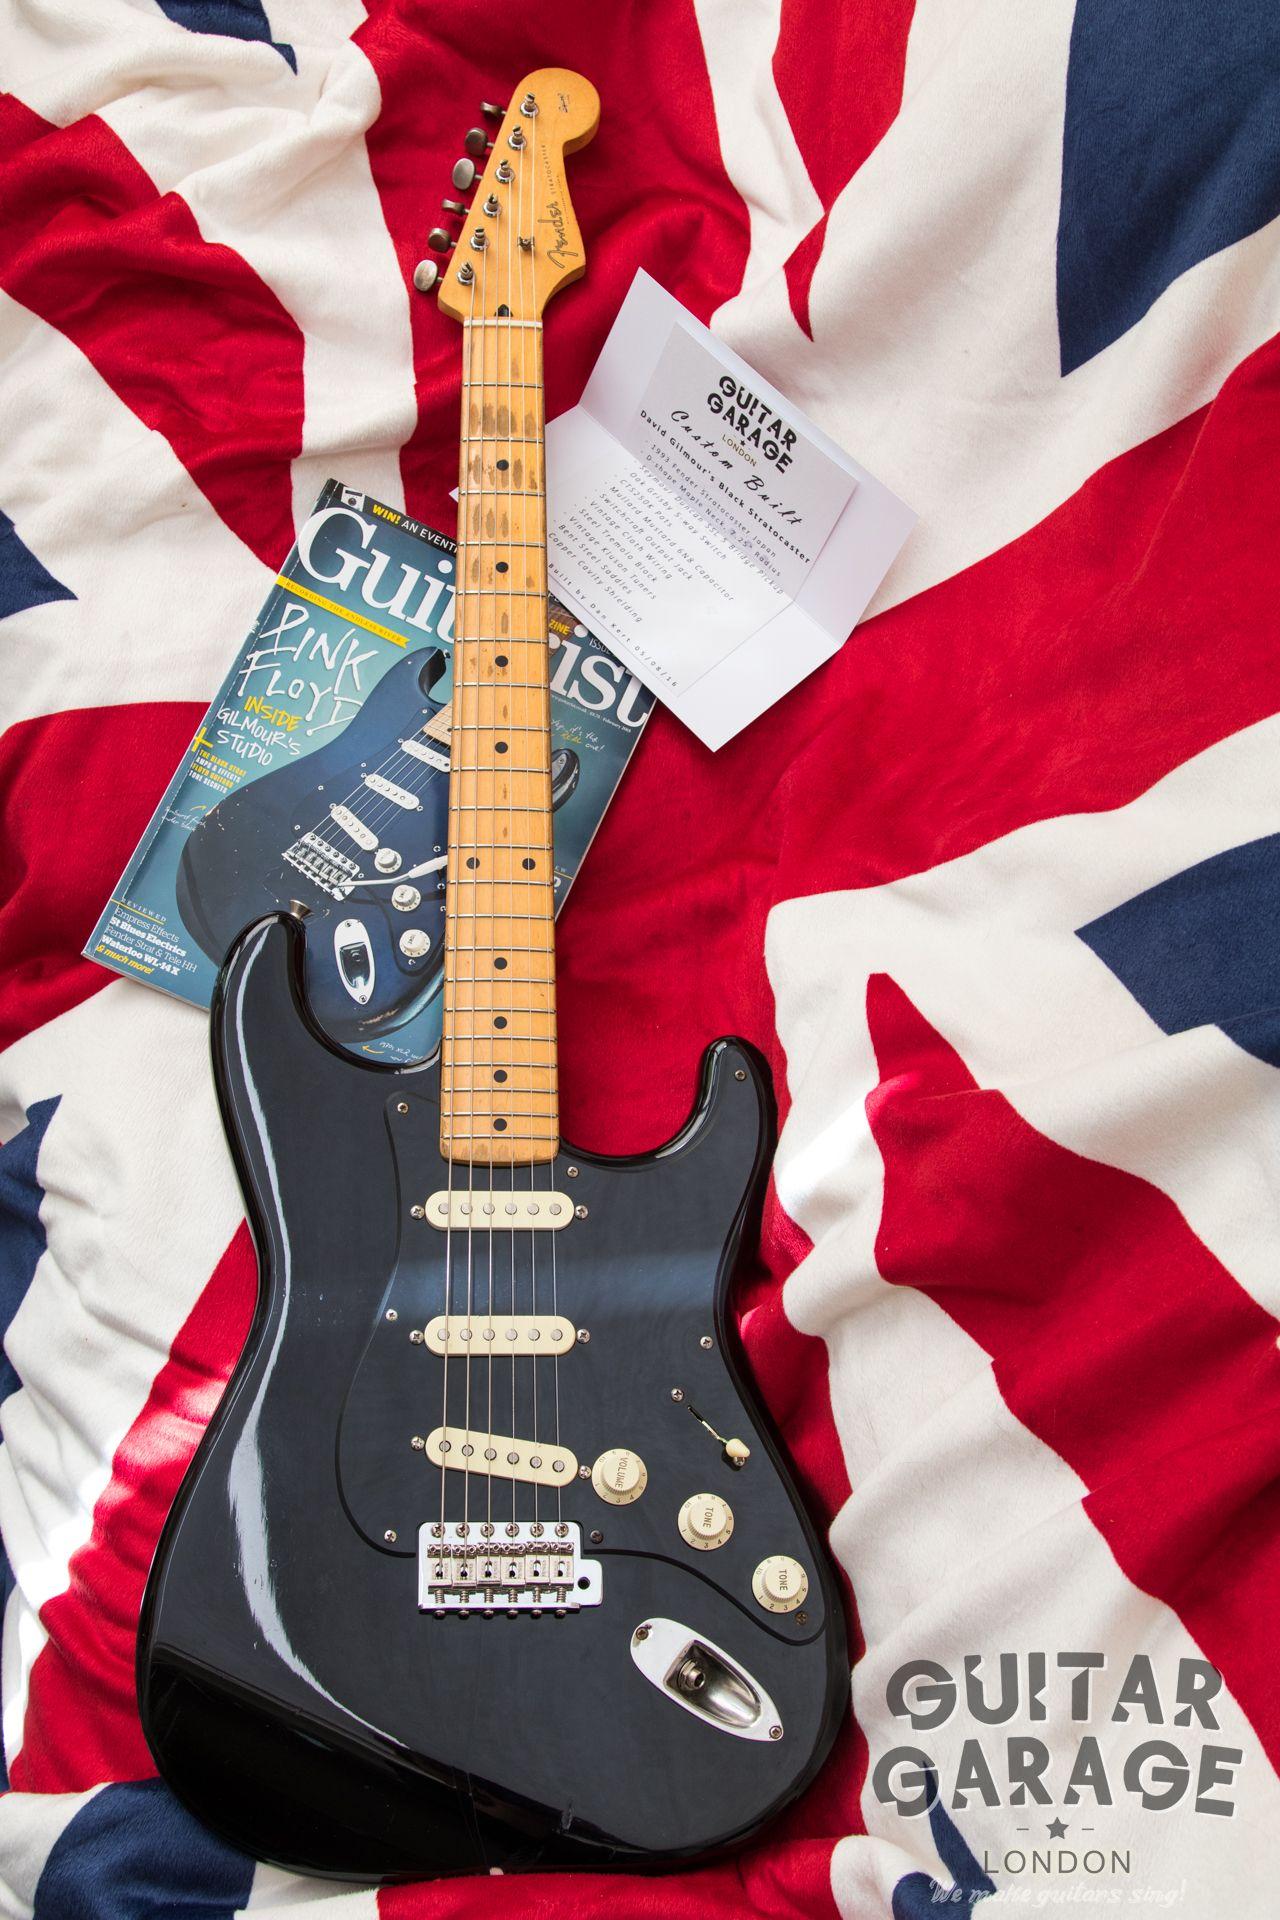 GUITAR GARAGE LONDON CUSTOM BUILT Dave Gilmour's Black Strat